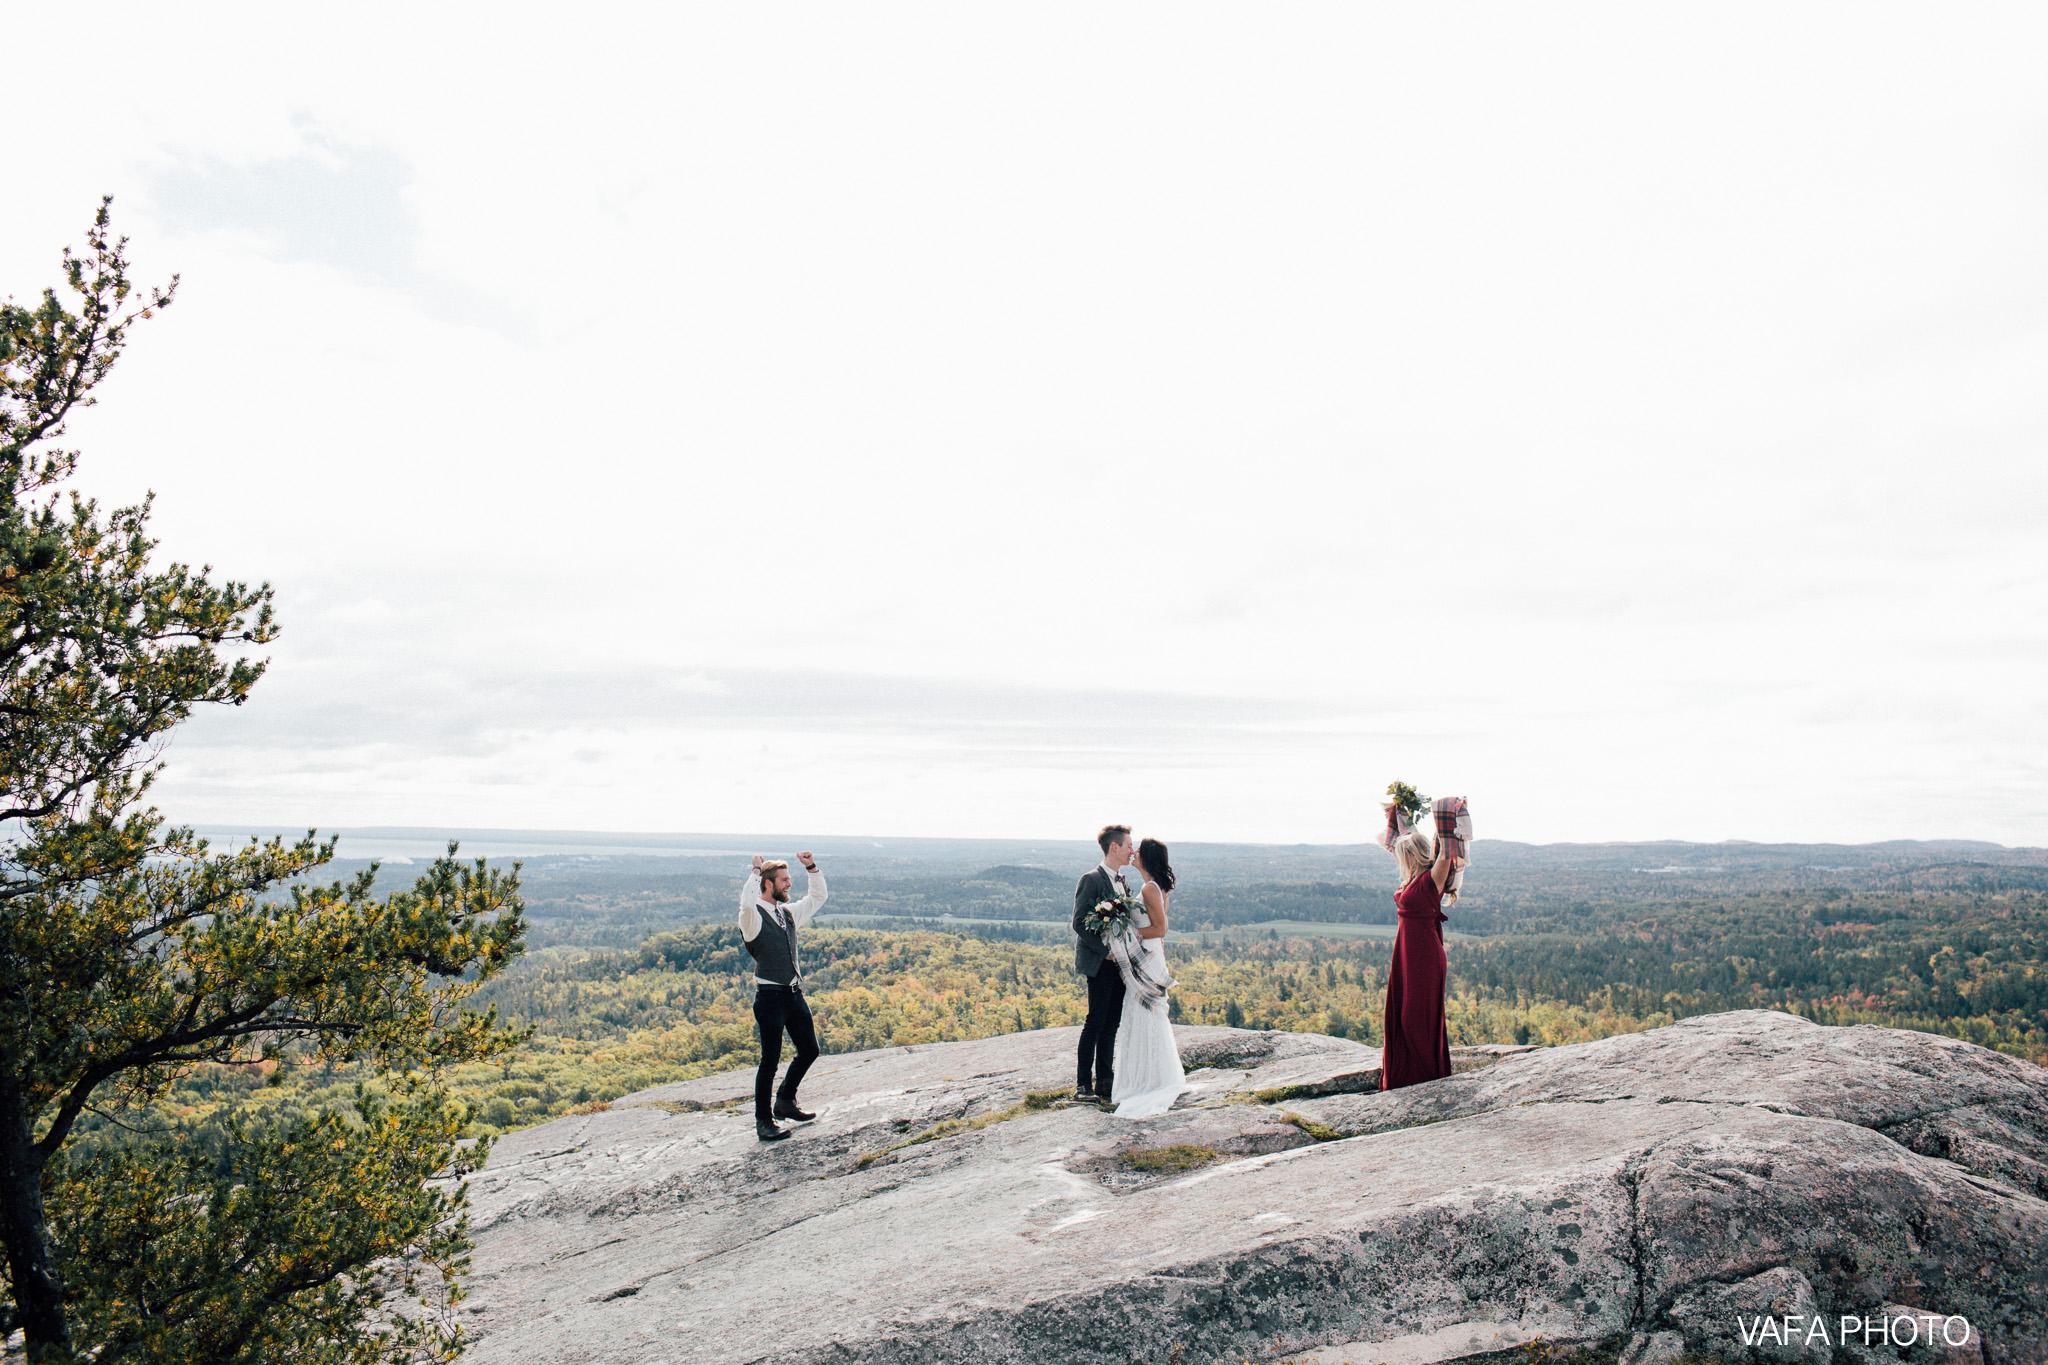 Hogback-Mountain-Wedding-Chelsea-Josh-Vafa-Photo-394.jpg